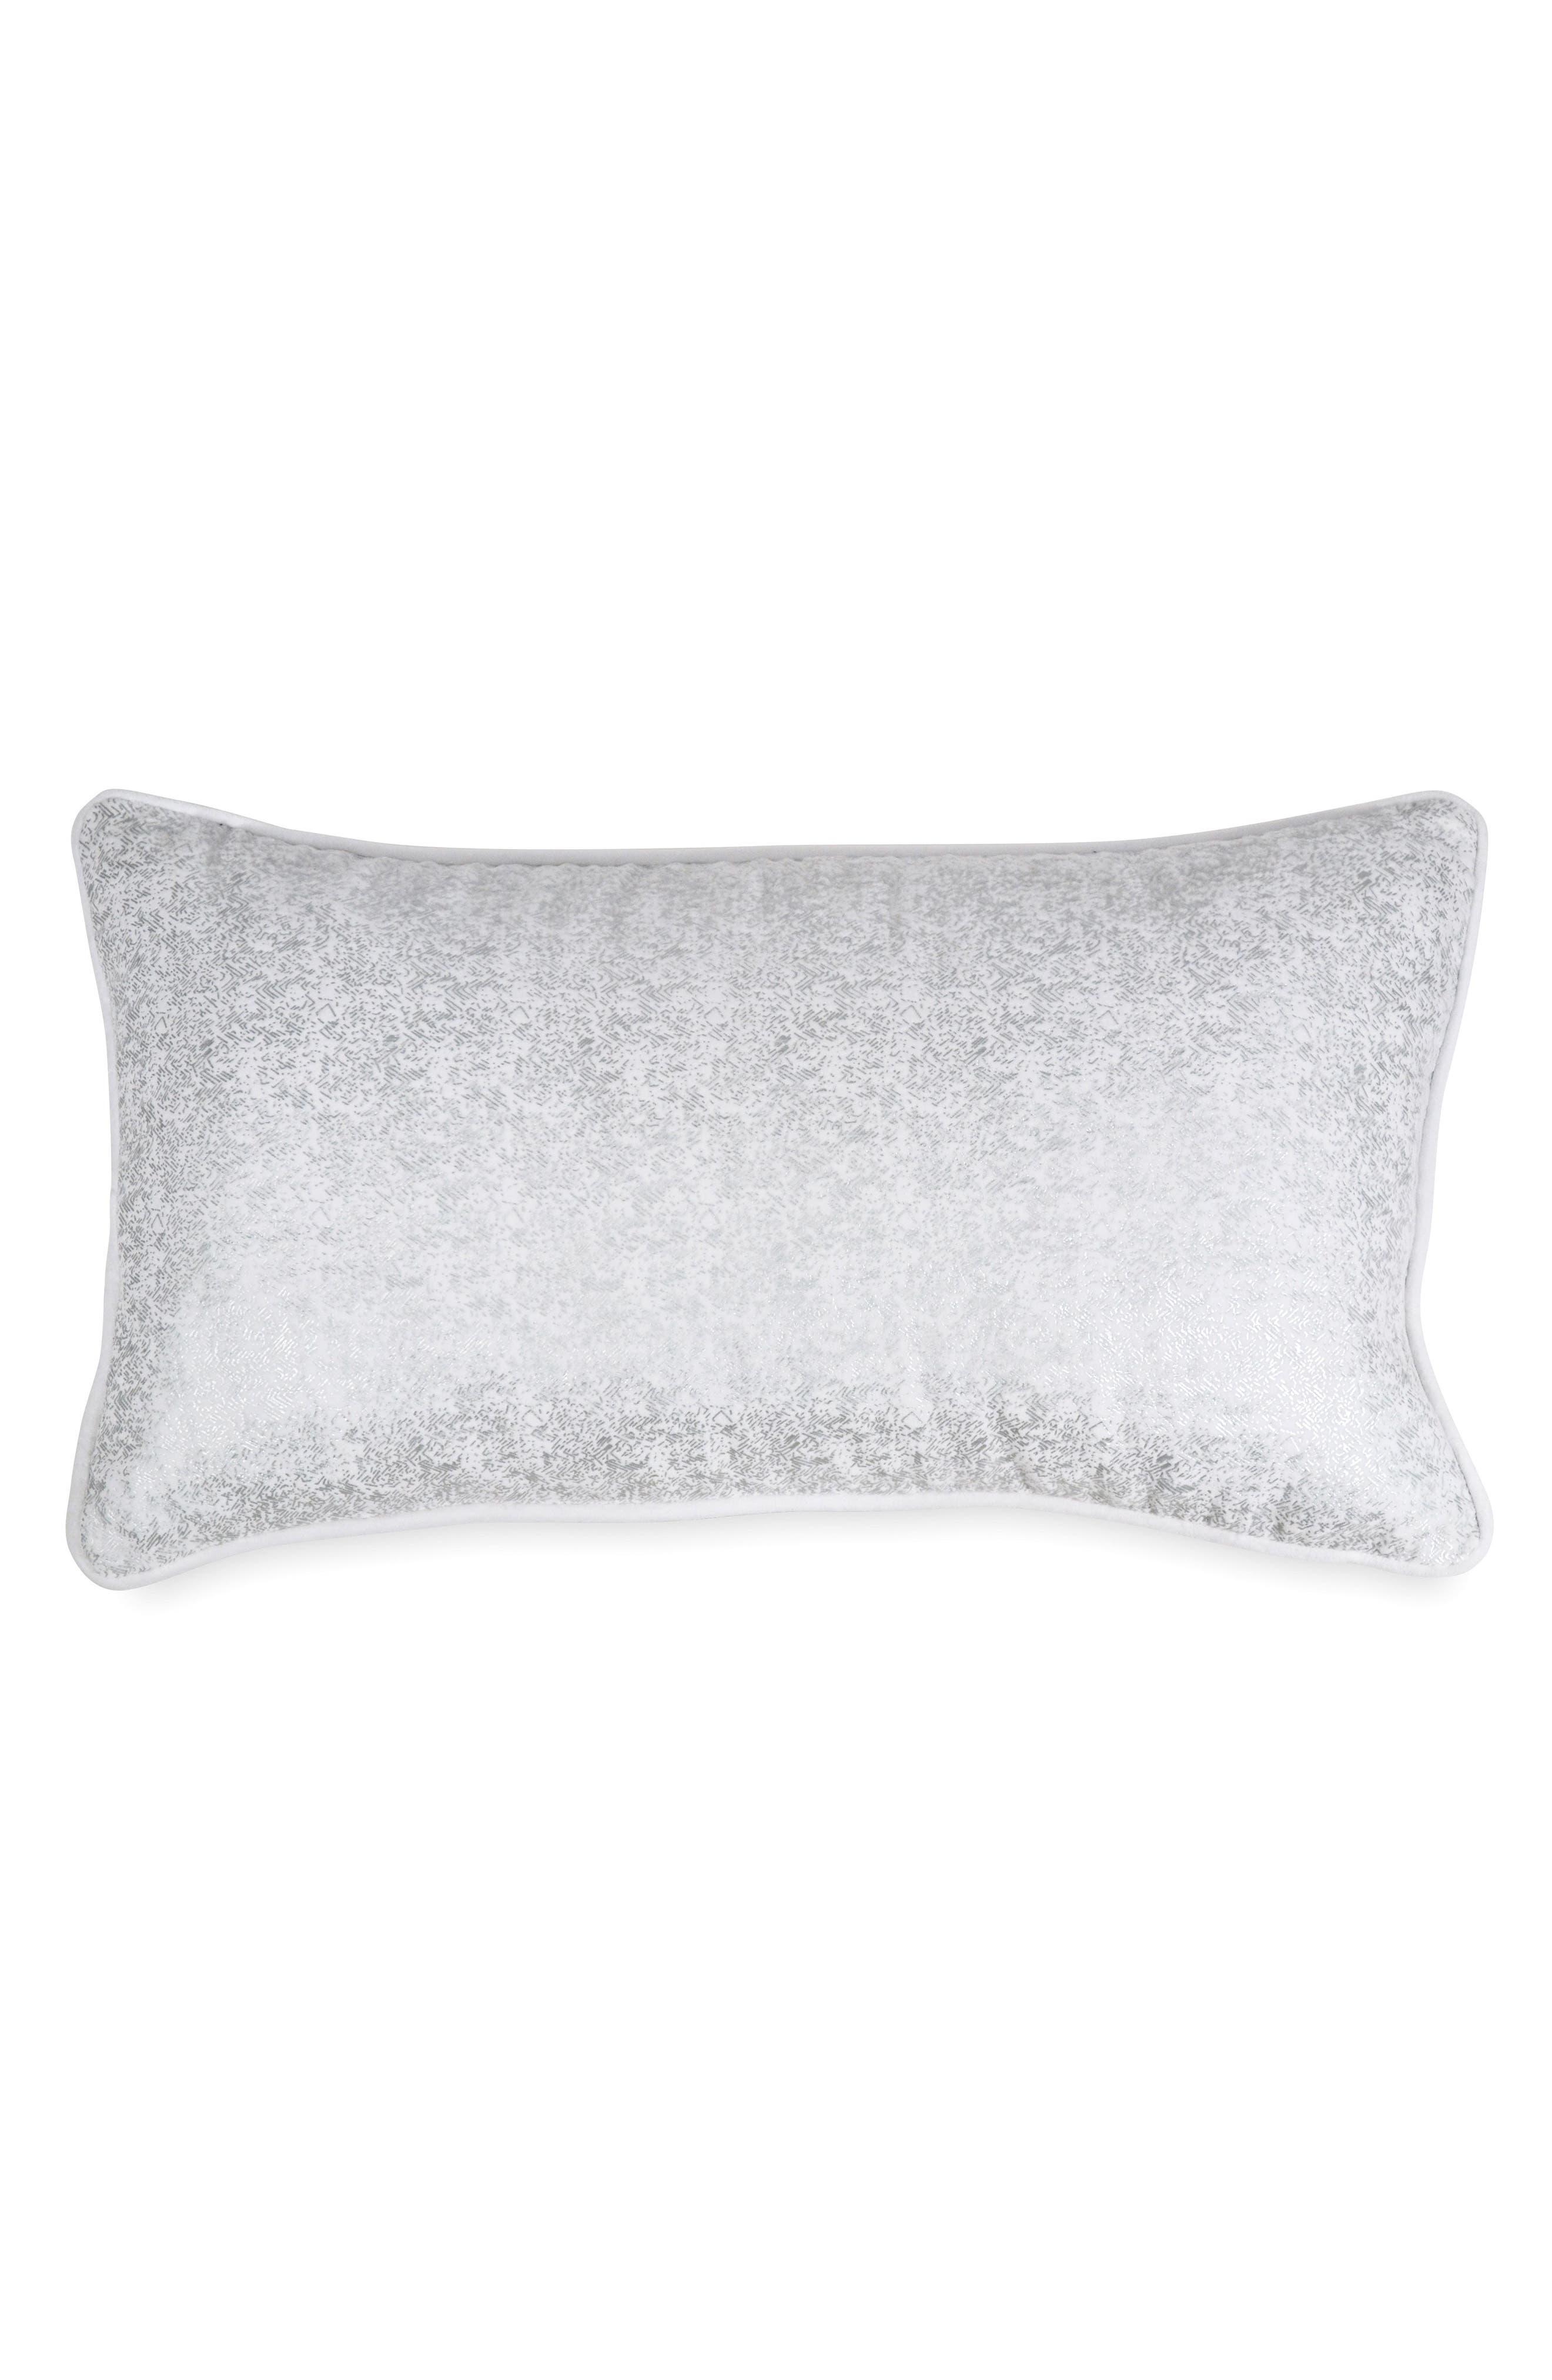 Motion Velvet Accent Pillow,                         Main,                         color, Oatmeal